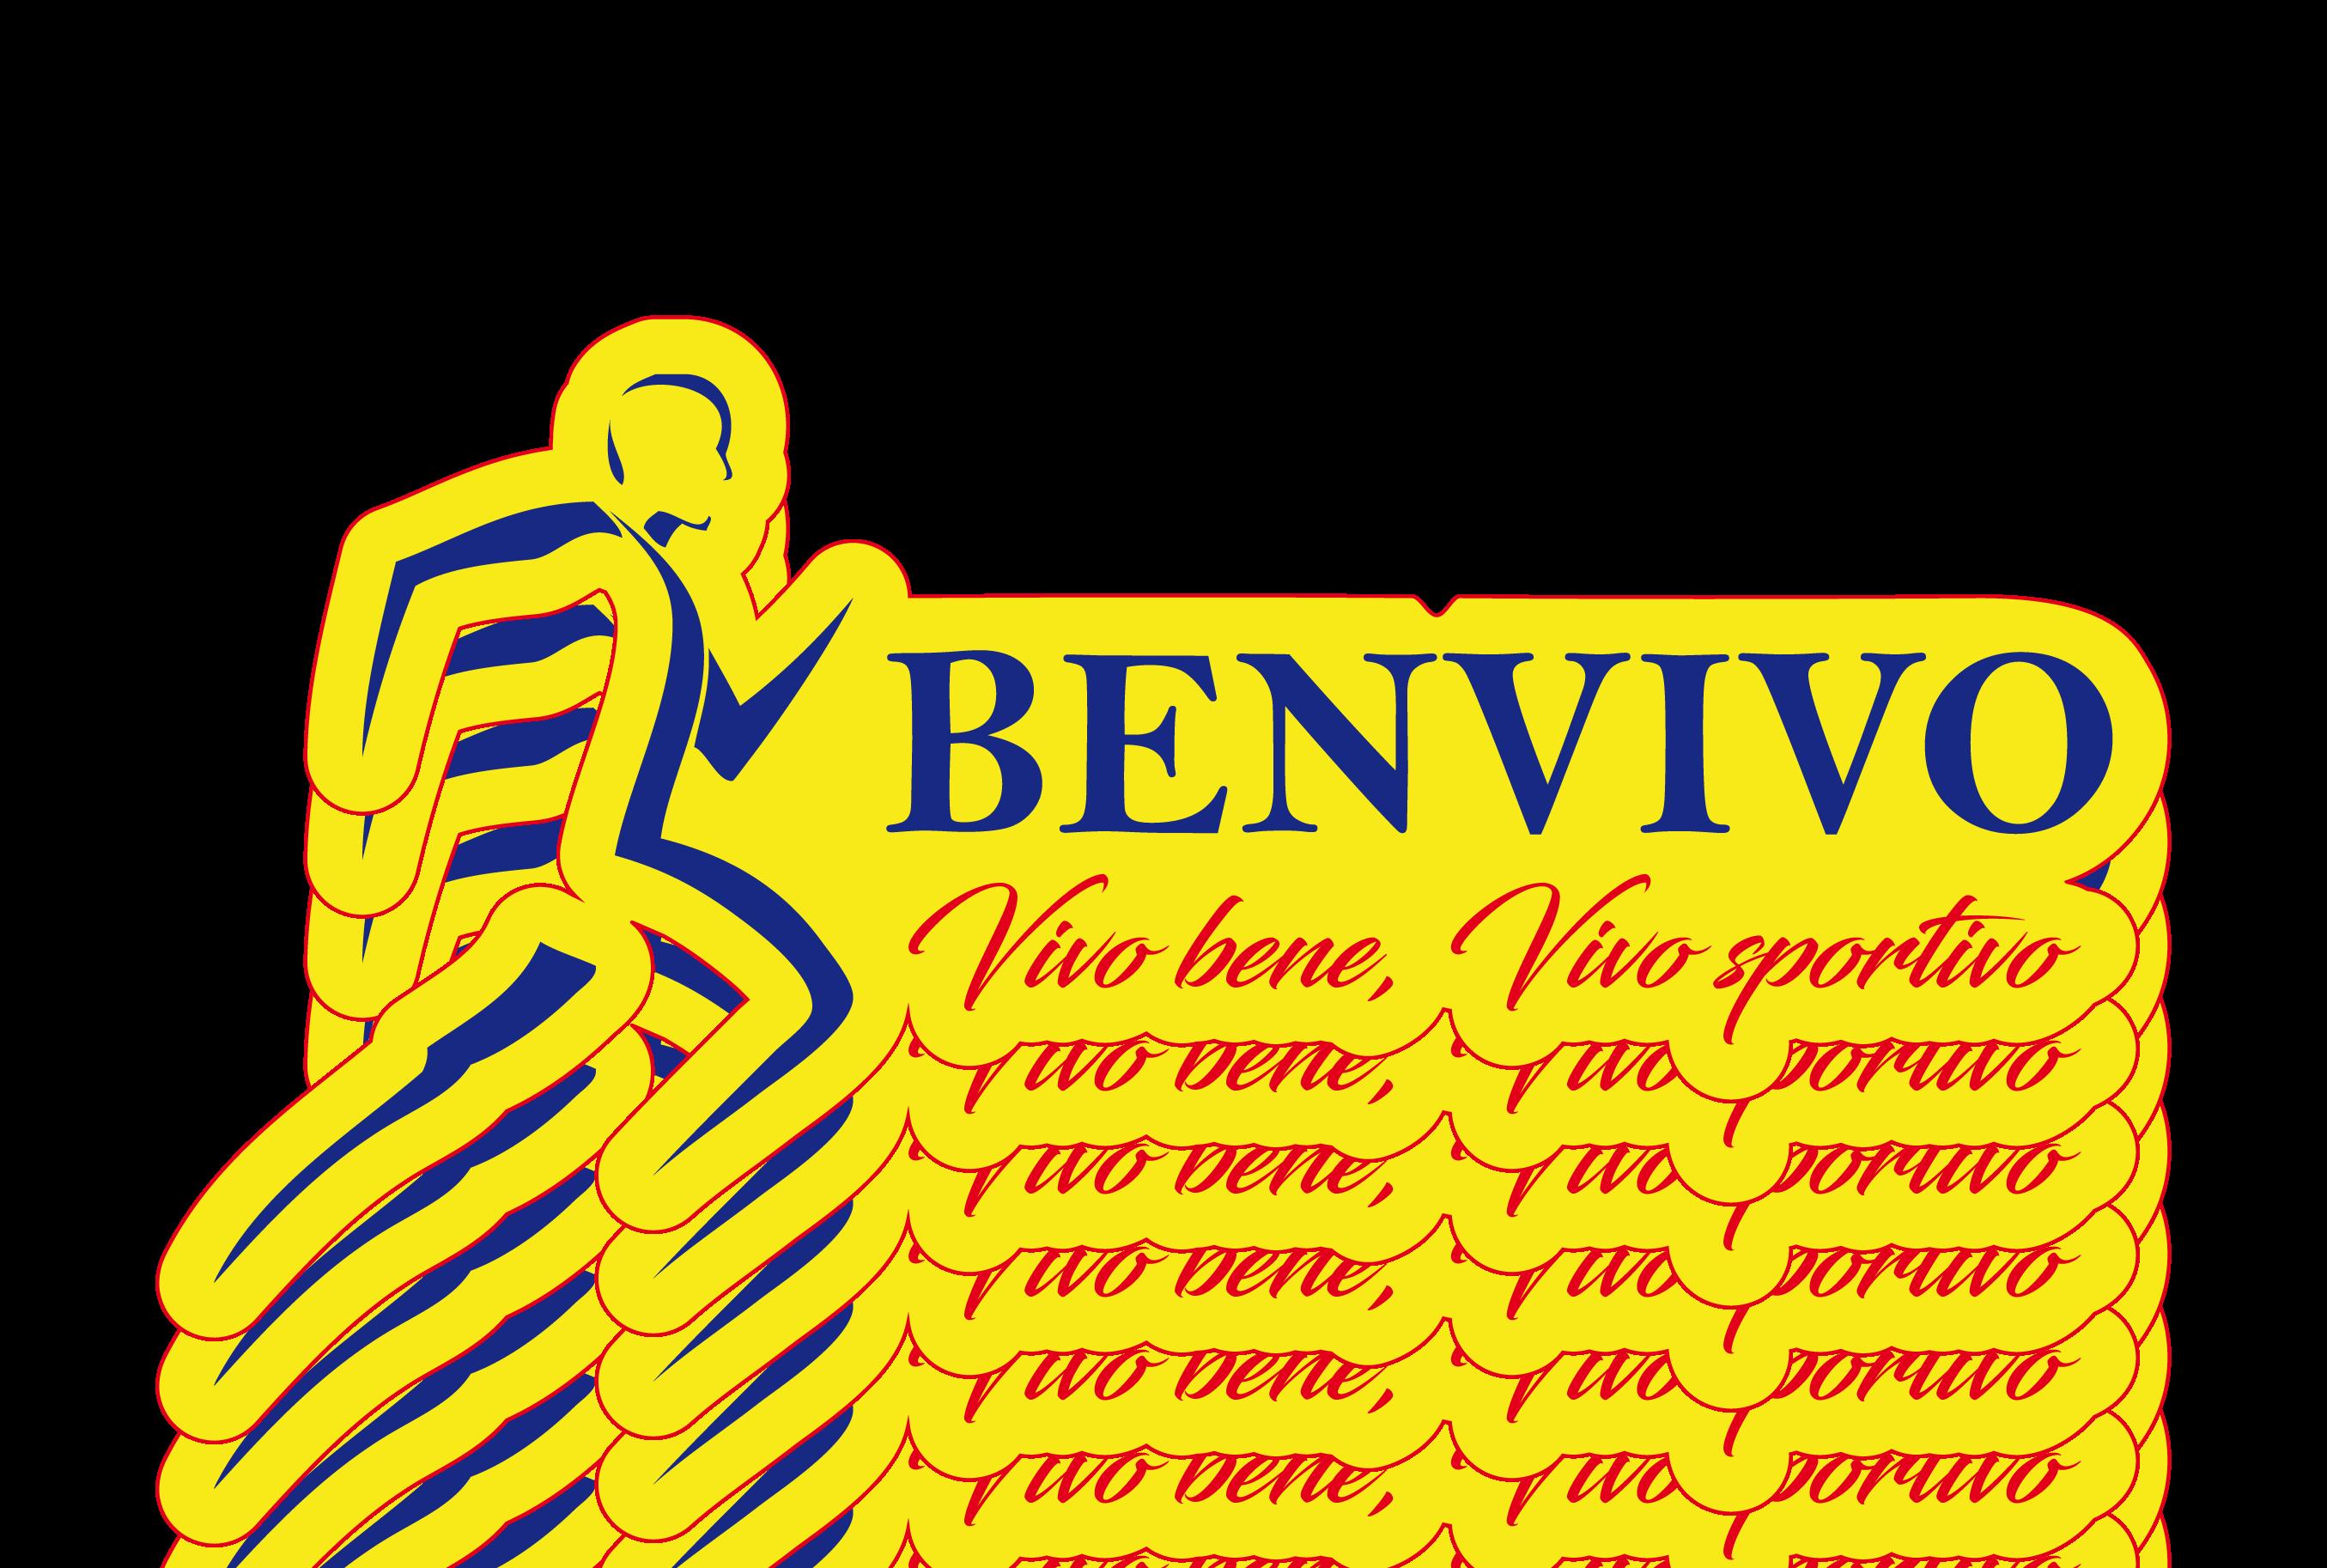 Benvivo